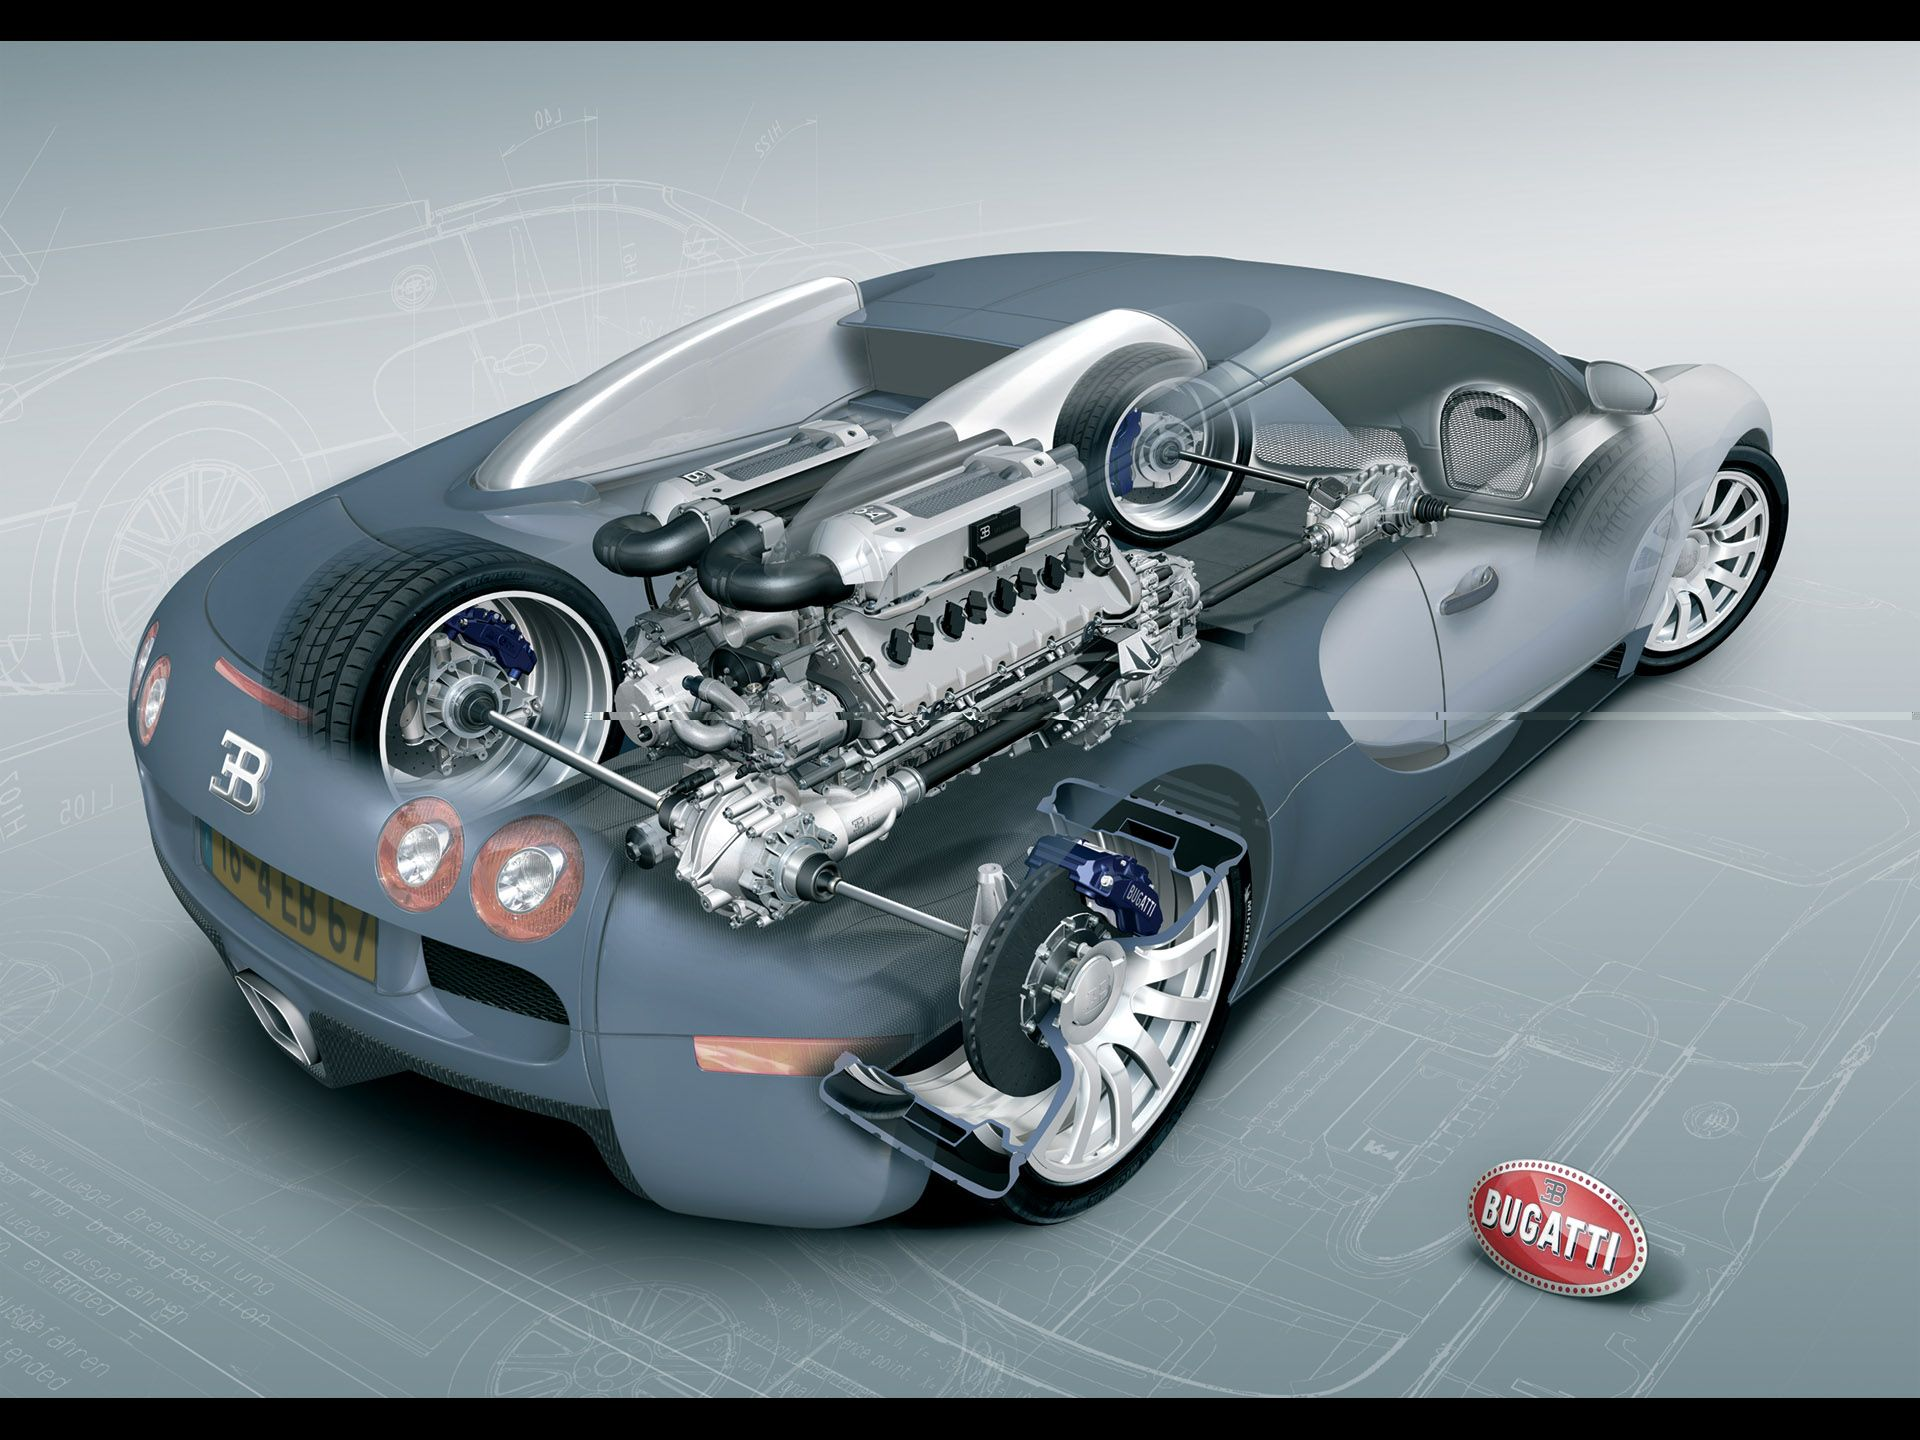 2013 bugatti veyron engine diagram automotive block diagram u2022 rh carwiringdiagram today W12 Engine Lamborghini V12 Engine